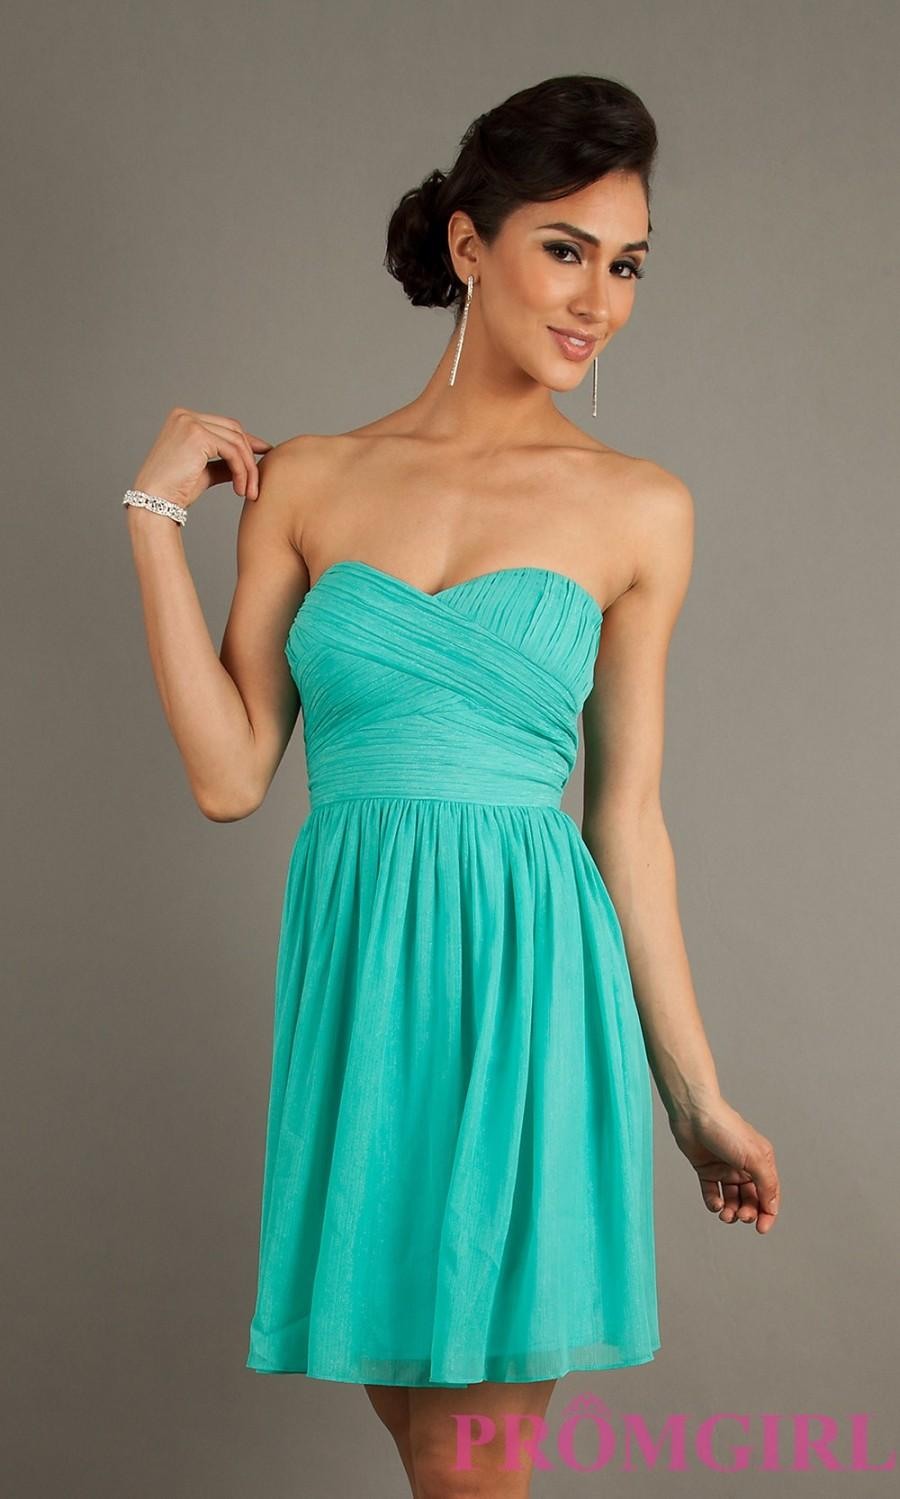 Short Strapless Black Dress - Brand Prom Dresses #2569036 - Weddbook